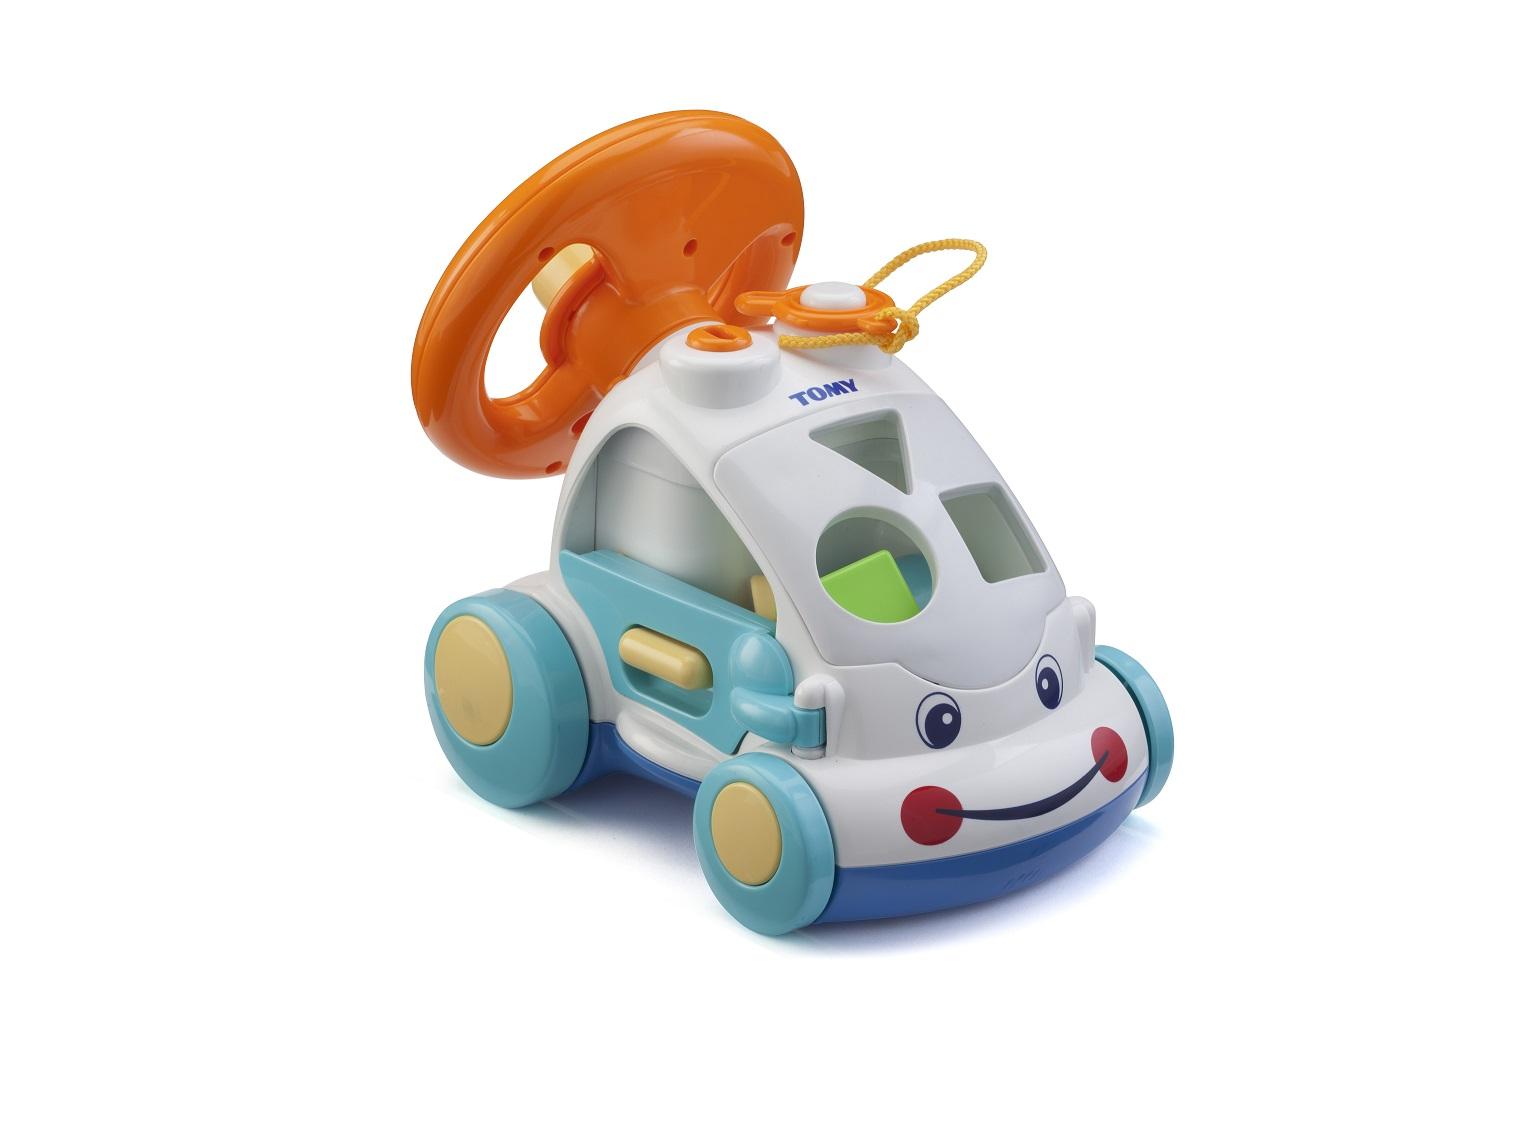 Интерактивный автомобиль-сортерСортеры, пирамидки<br>Интерактивный автомобиль-сортер<br>